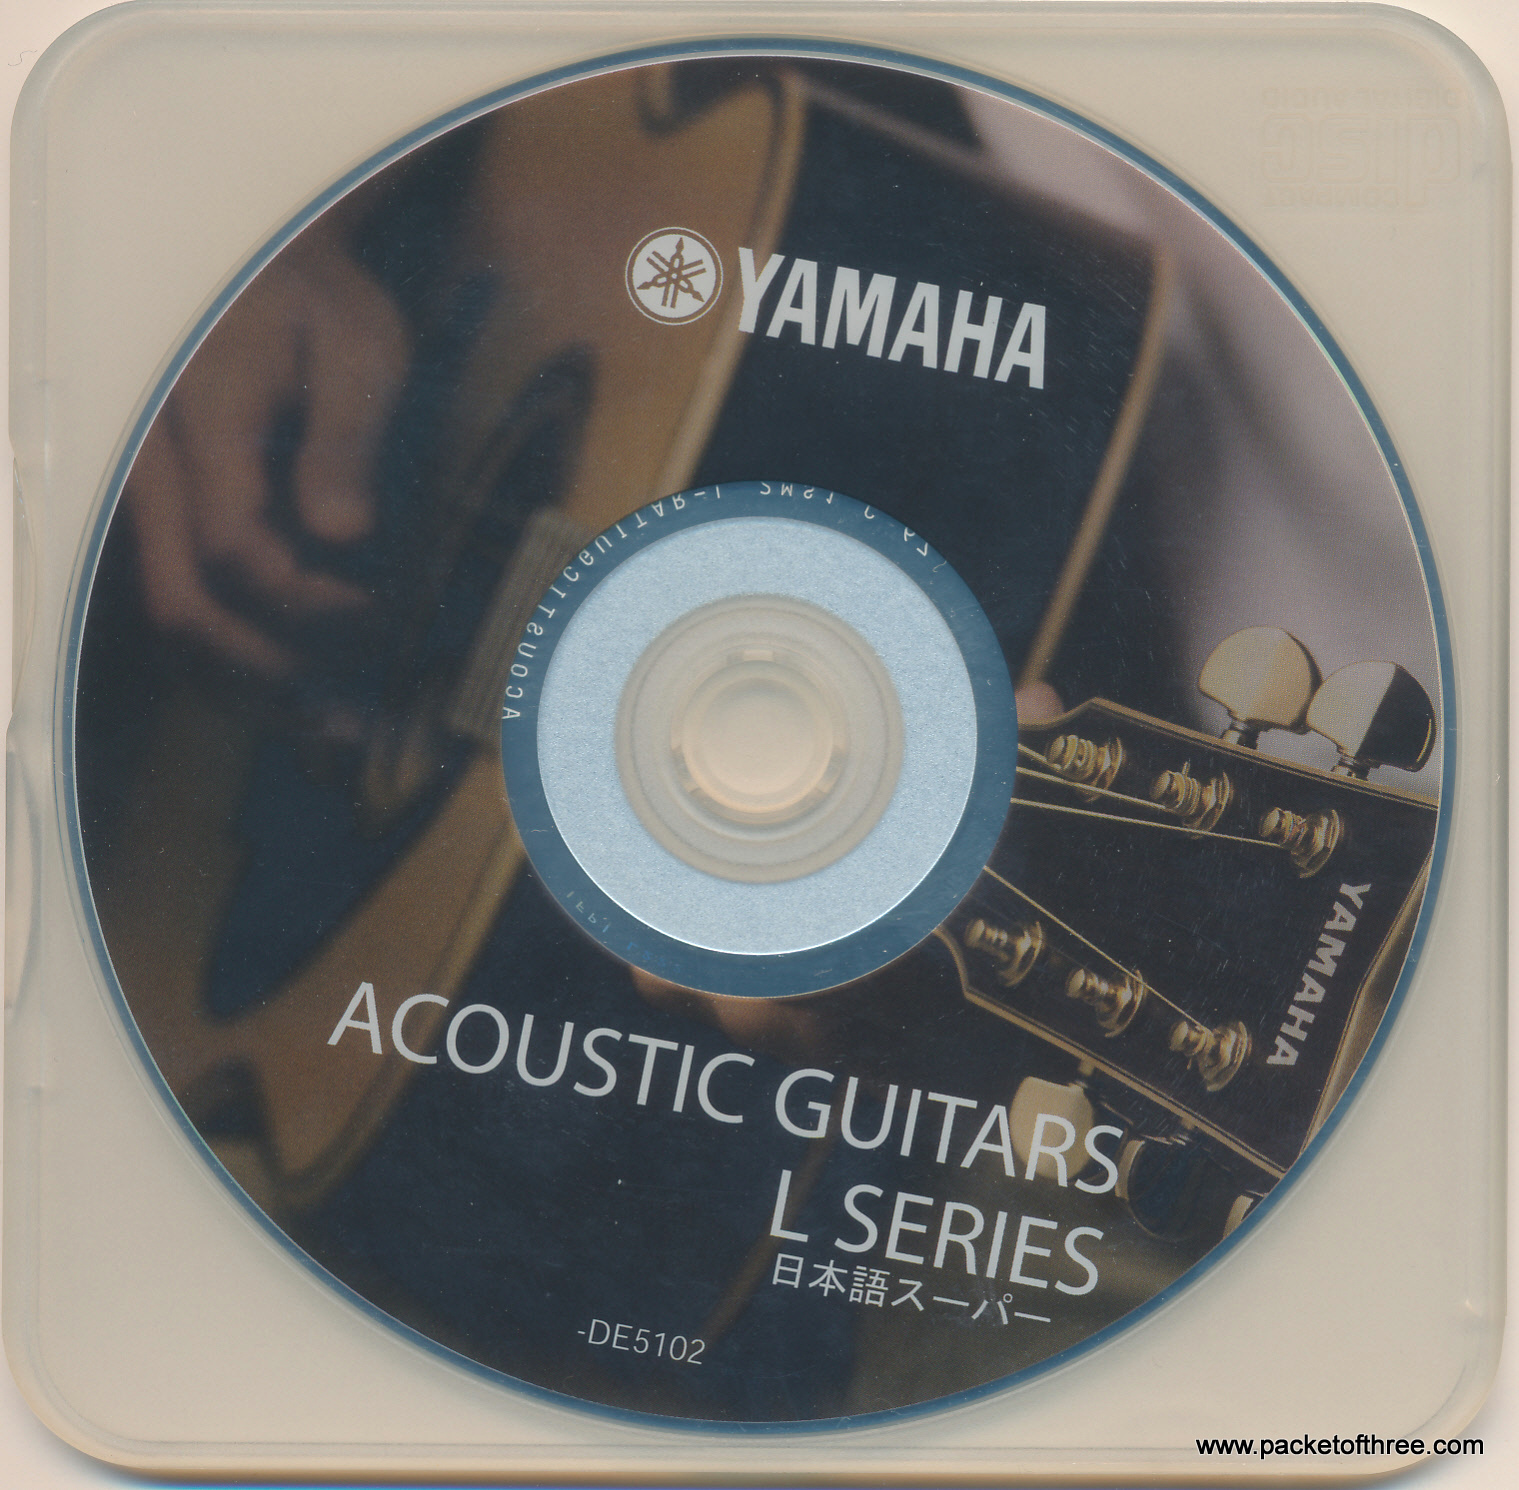 Yamaha Guitars L Series with Glenn Tilbrook